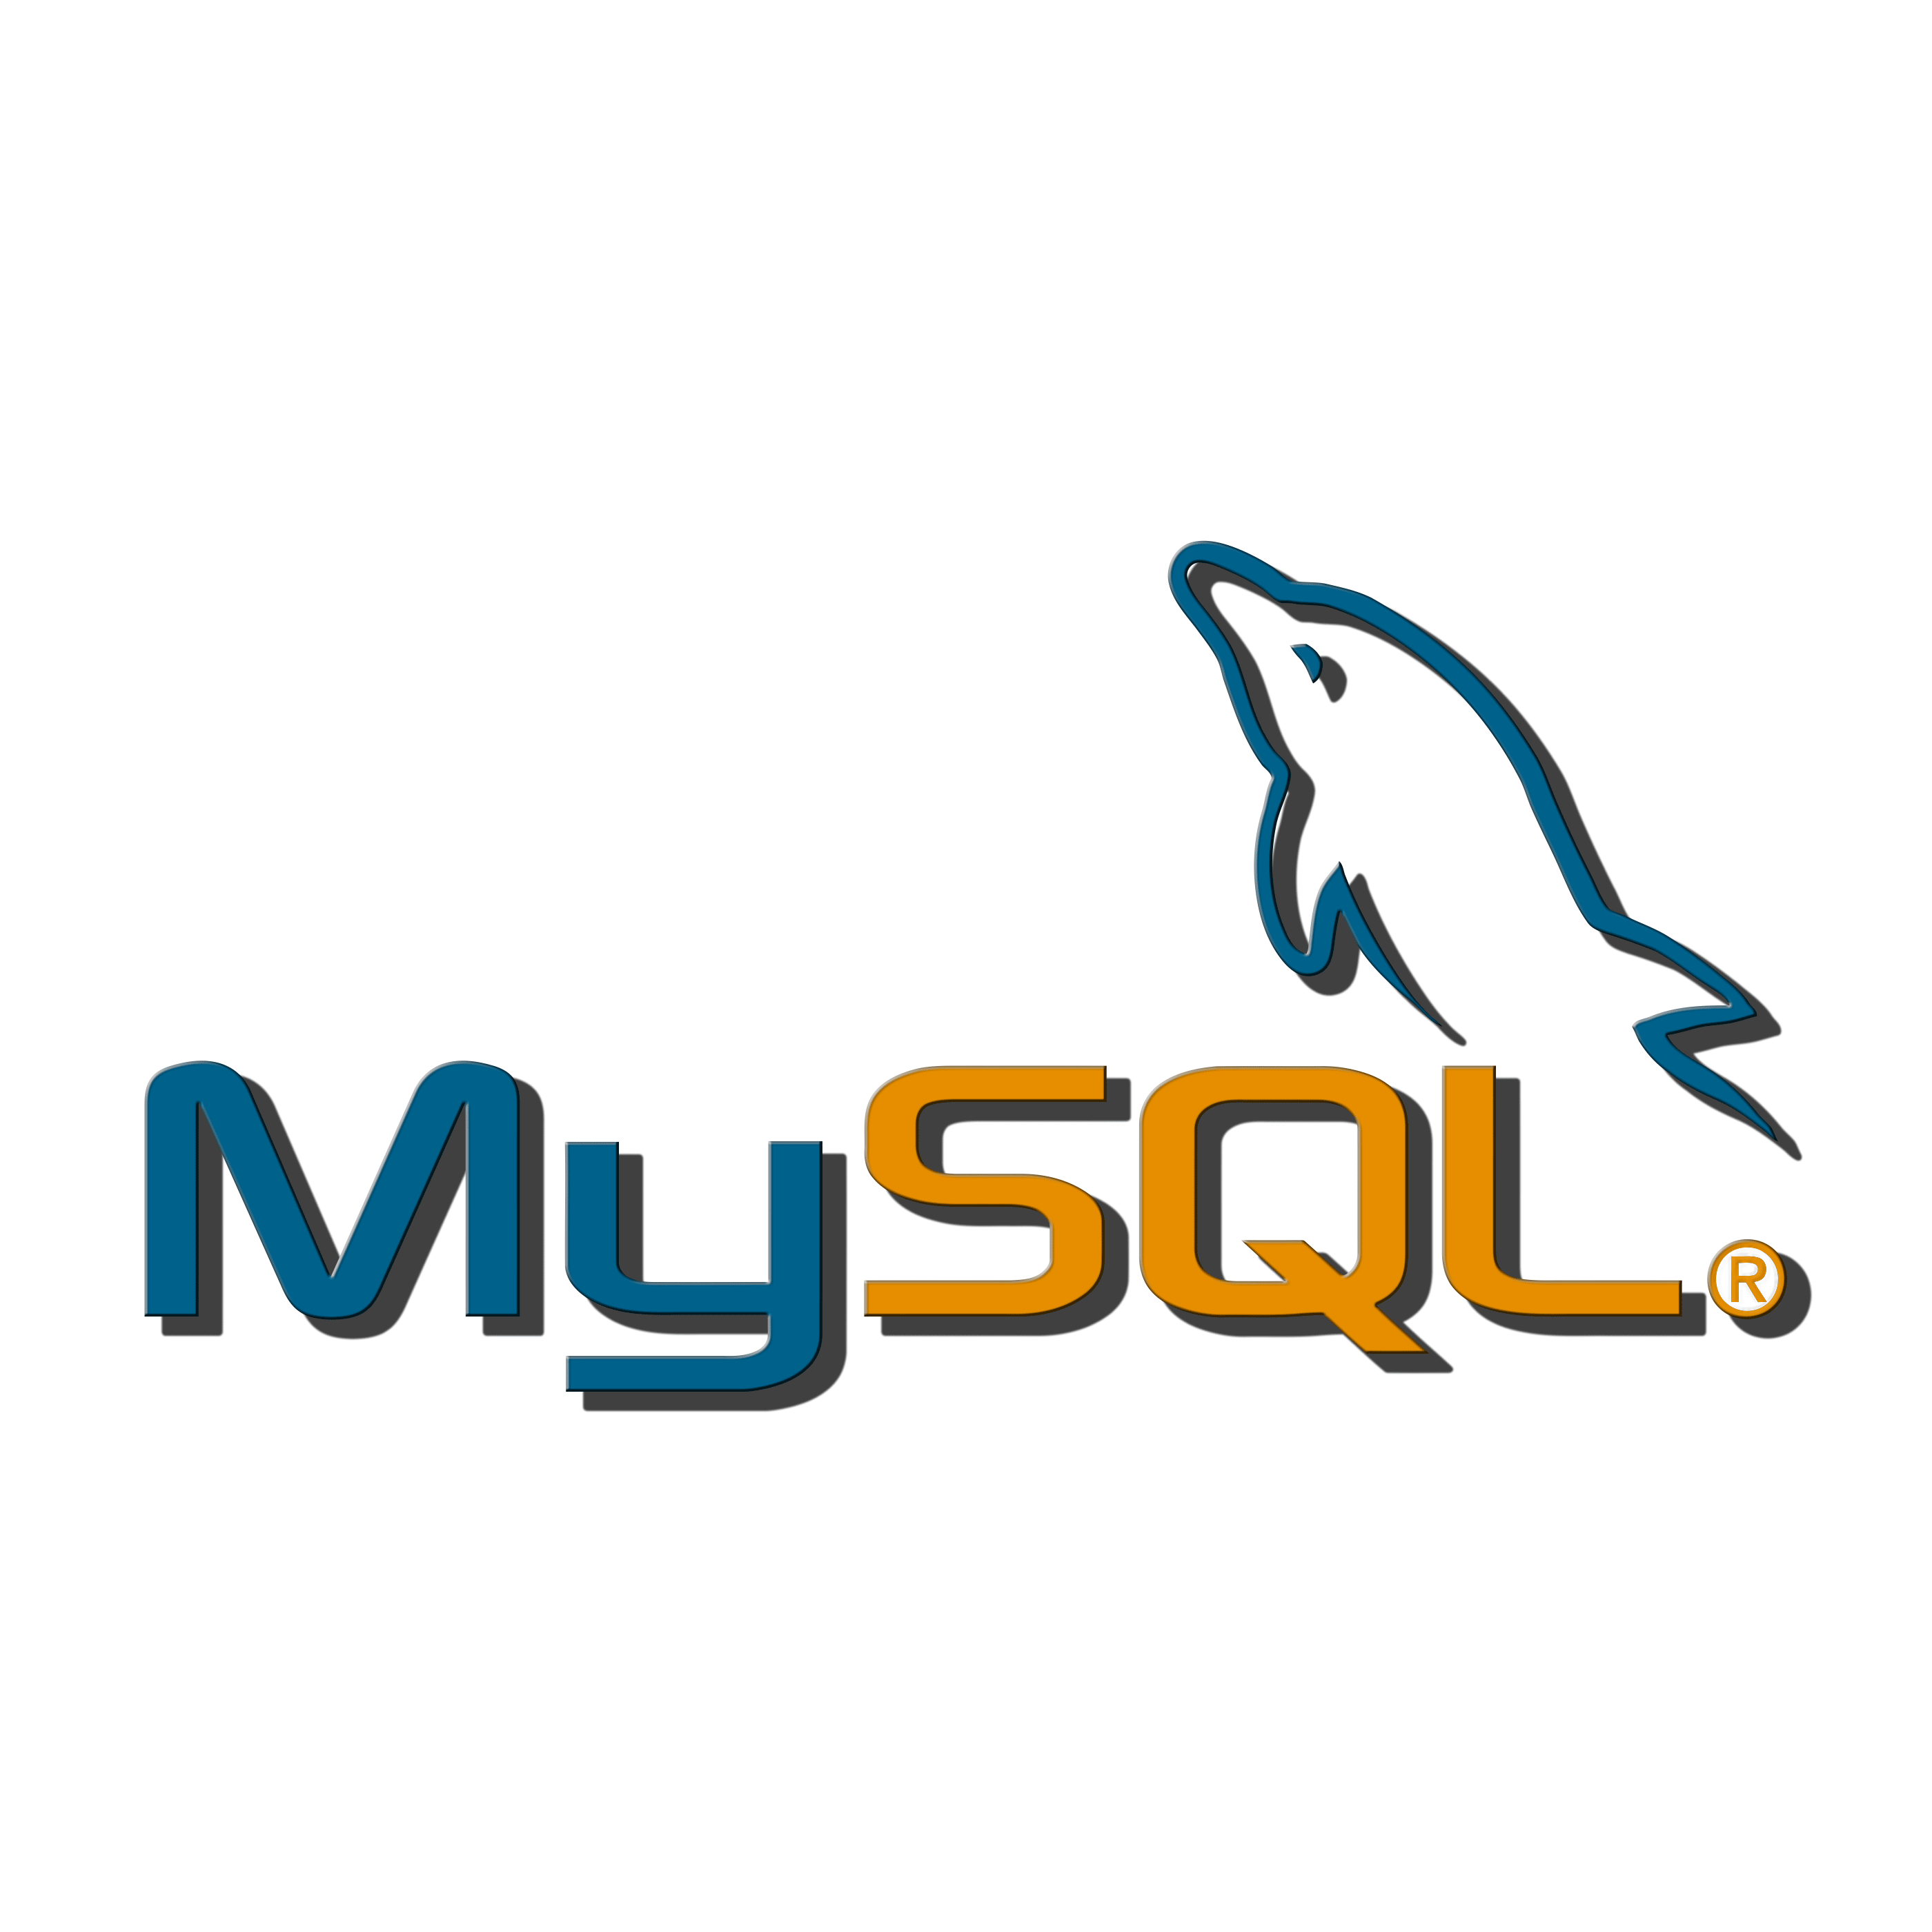 mysql-logo_2800x2800_pixels1